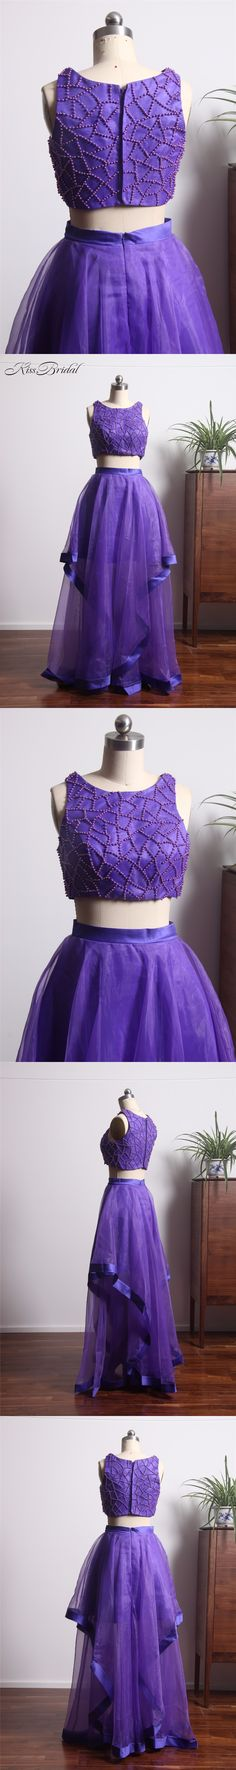 2018 Newest Design 2 Pieces Prom Dresses High Neck A-line Tulle Purple Evening Formal Gowns vestidos de gala